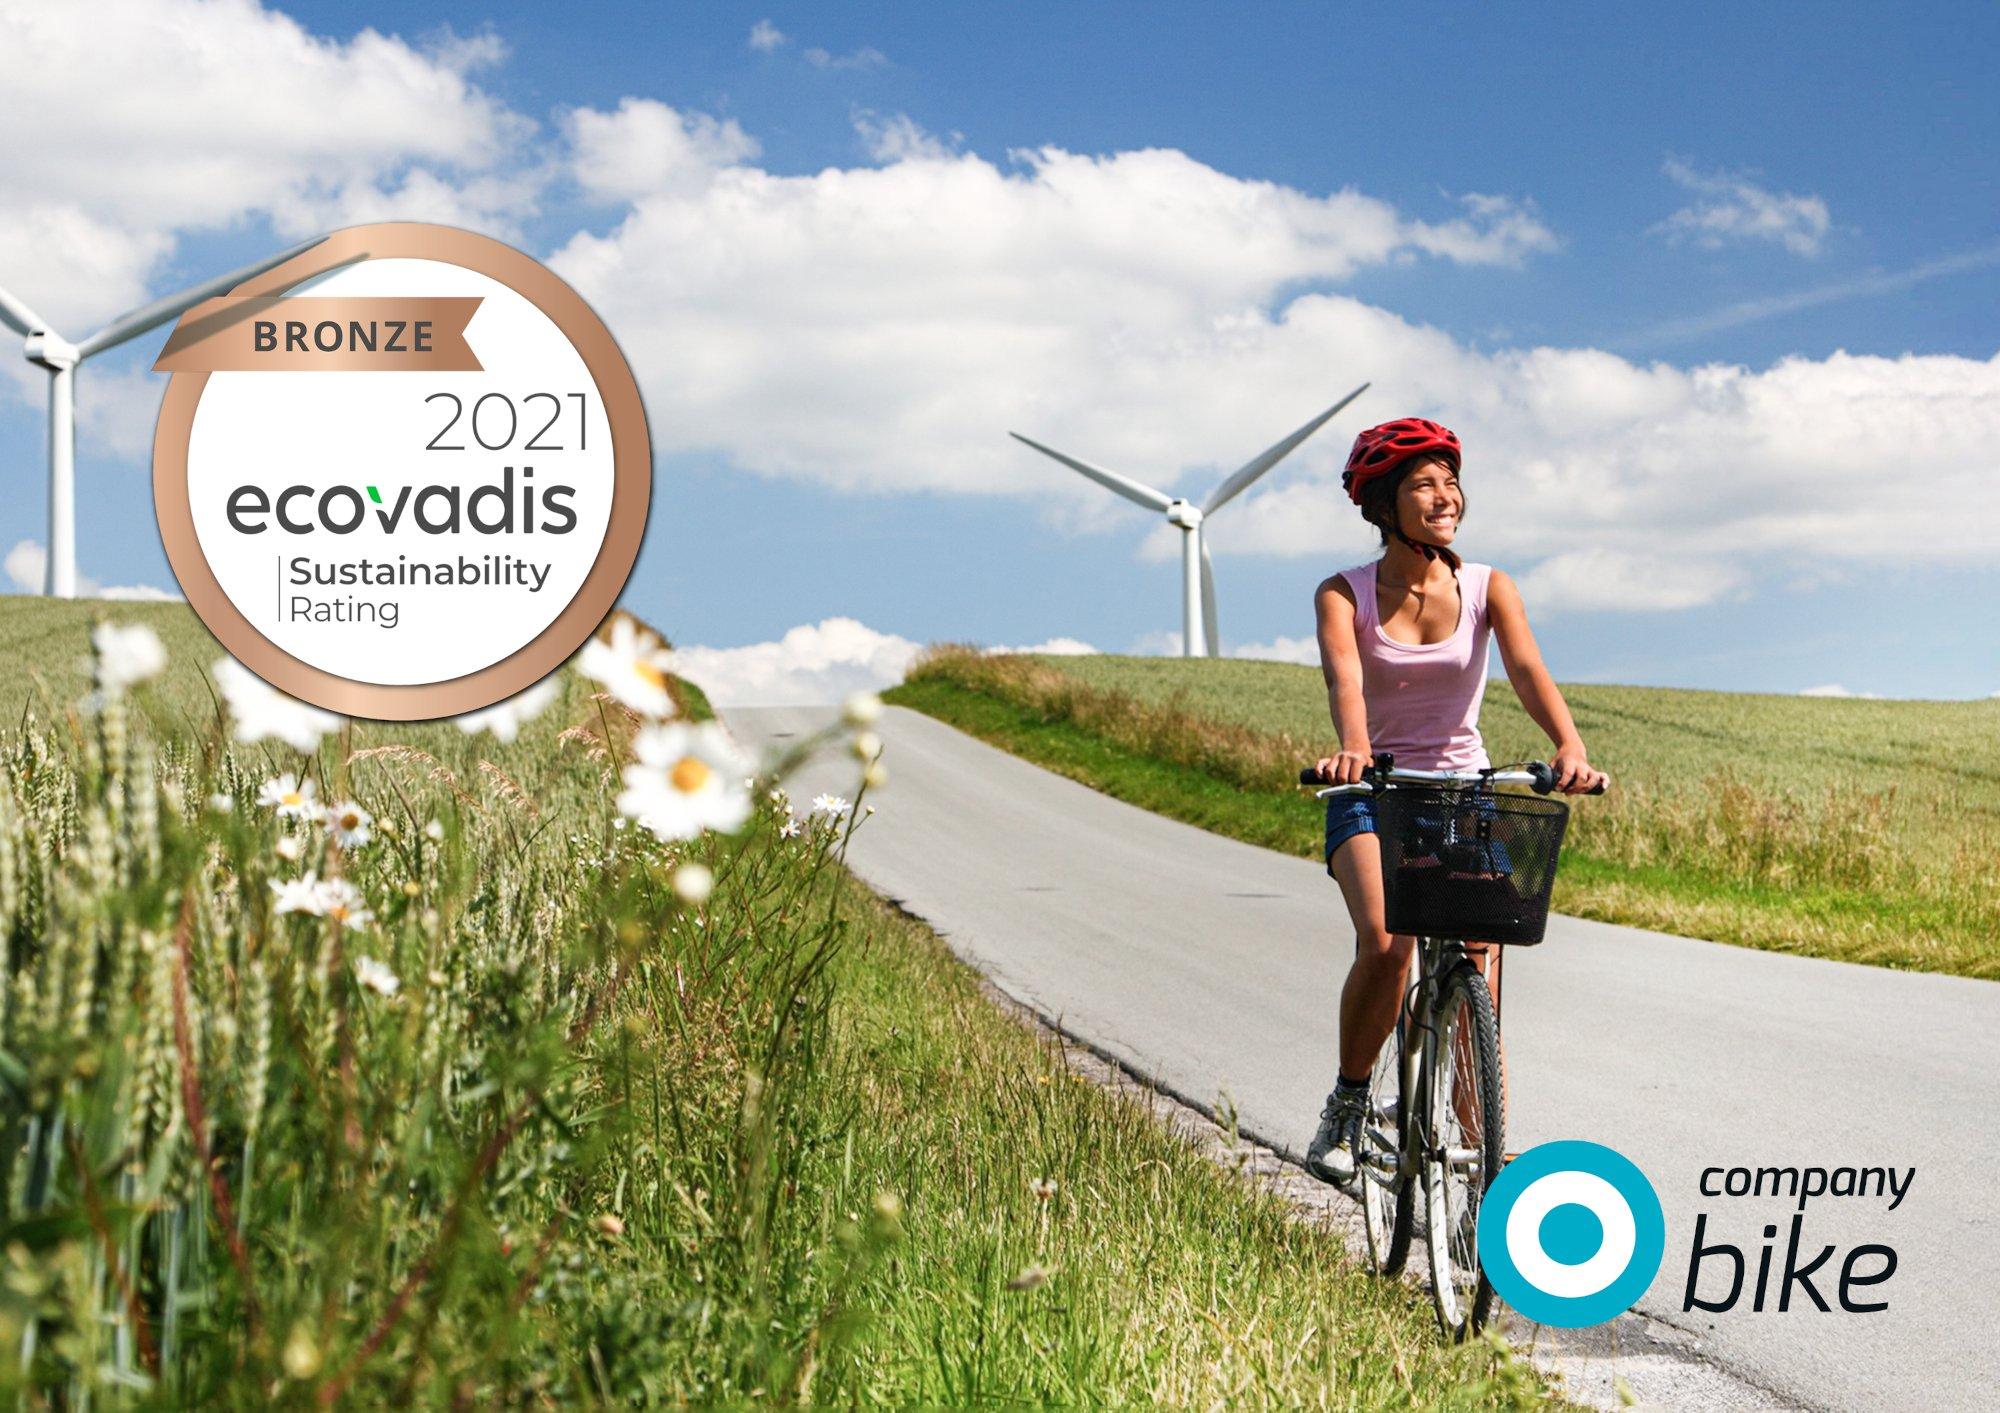 Sozial & nachhaltig: Company Bike erhält EcoVadis-Zertifizierung